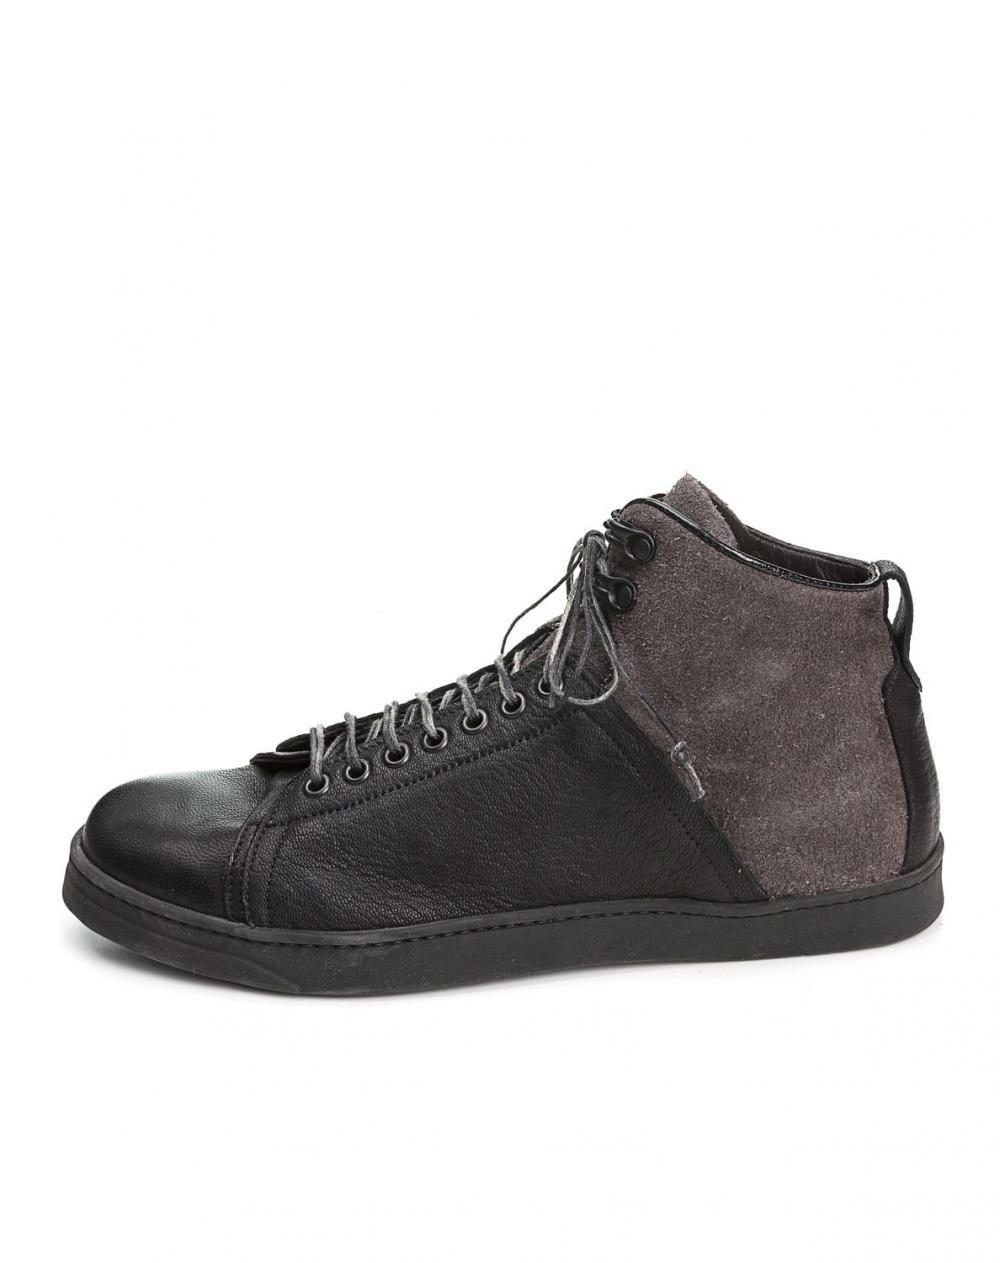 Schuh Everest Nero Split